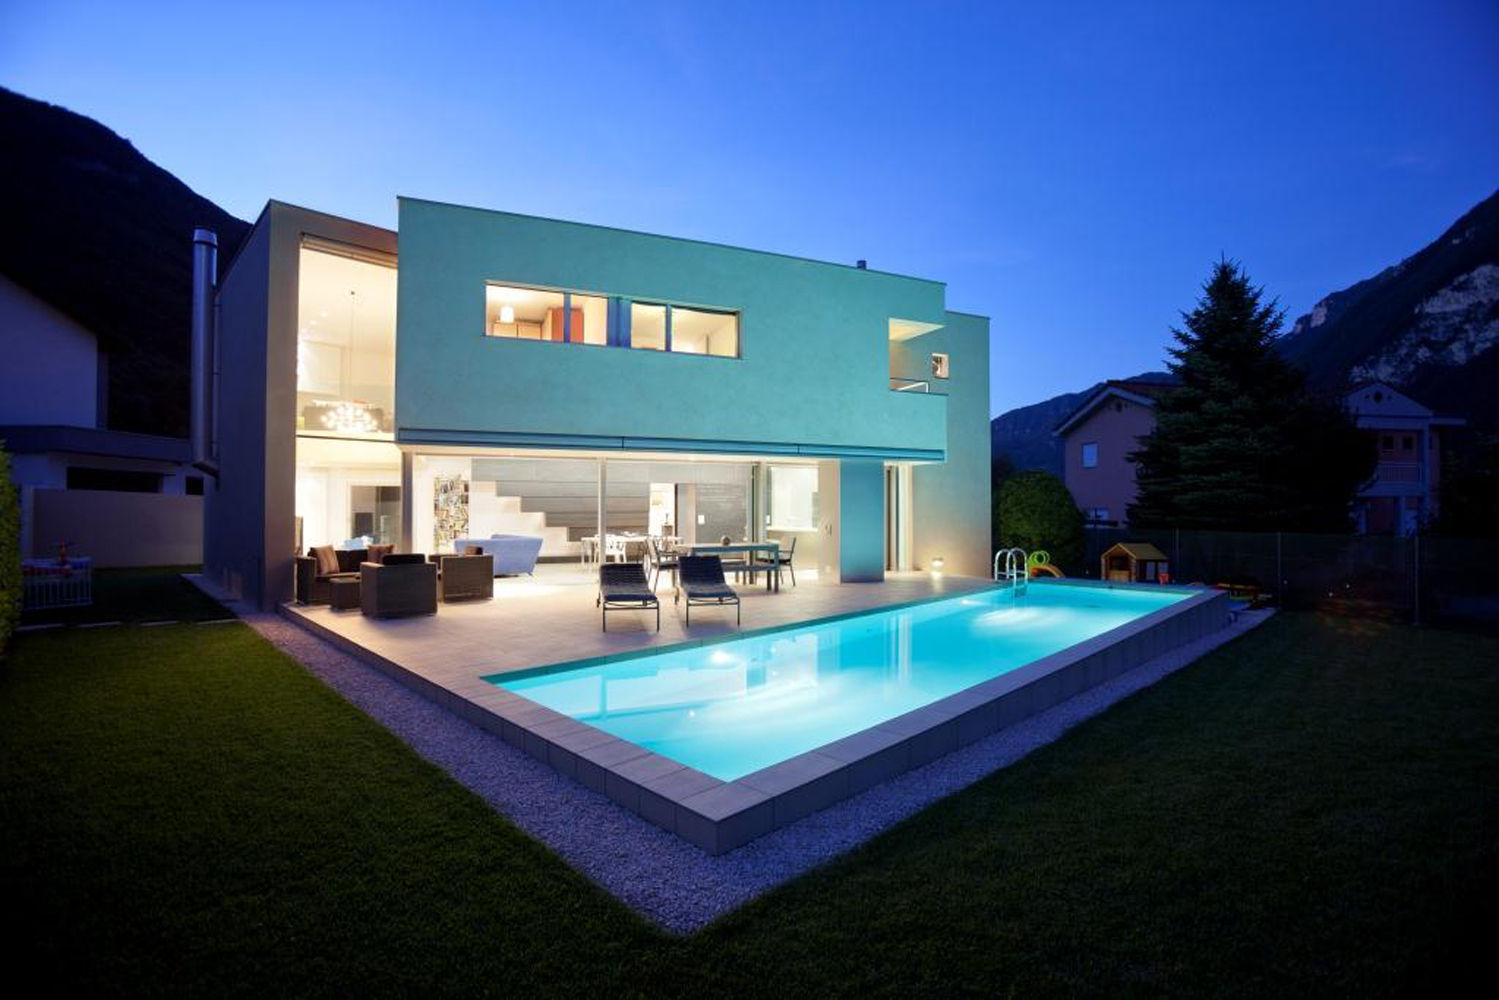 Giardini Moderni Con Piscina : Idee giardino con piscina idee giardino piccolo awesome beautiful